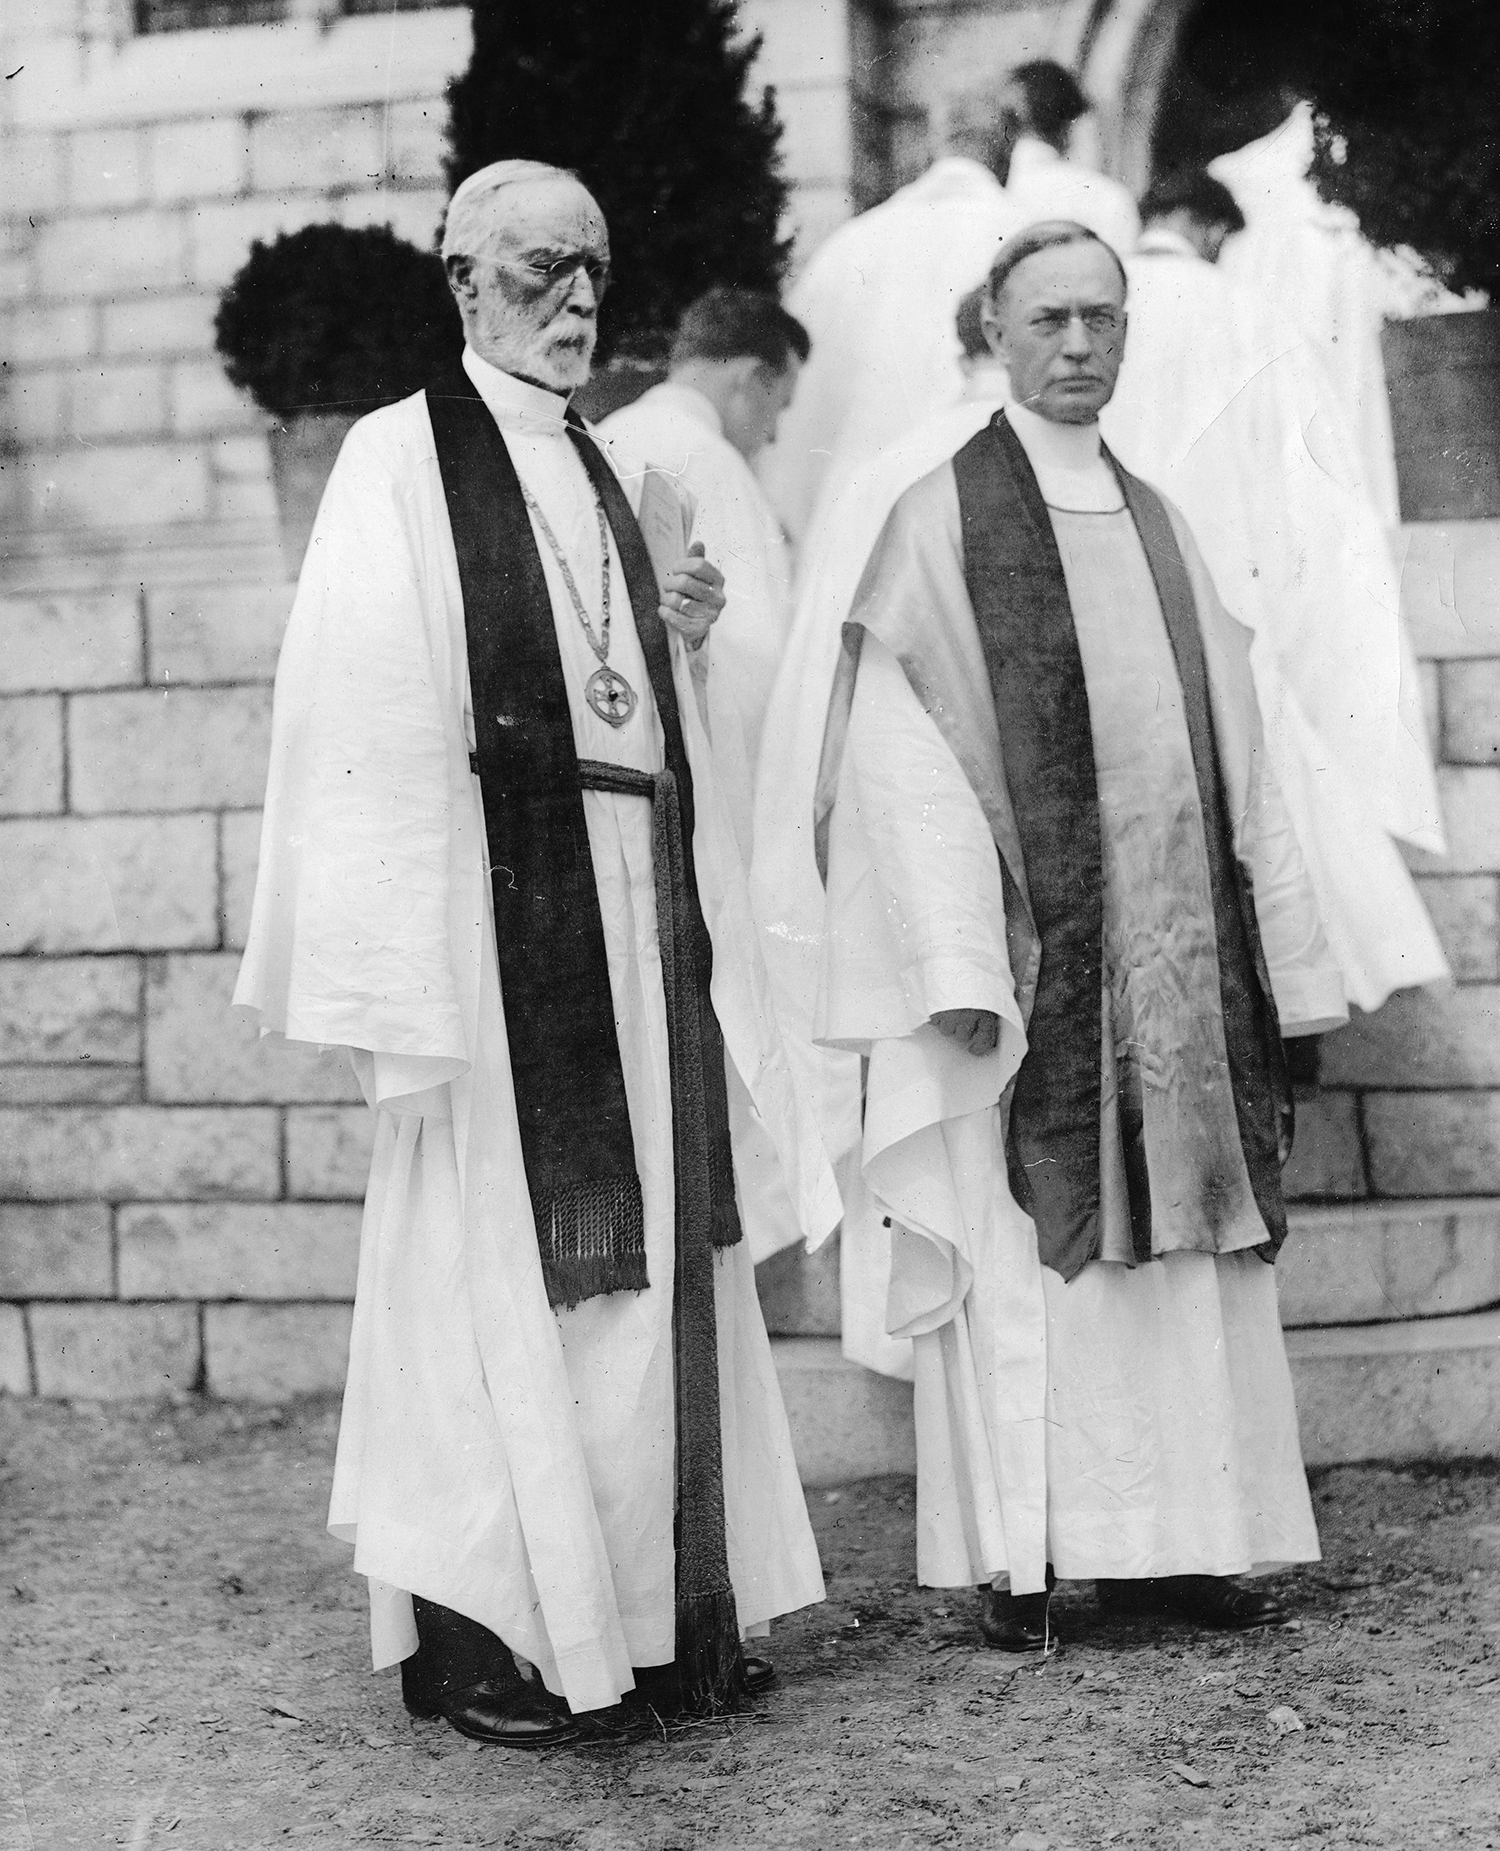 Figure 8: Bishop Emeritus William F. Pendleton (left) stands beside his brother, Bishop Nathaniel D. Pendleton, on dedication day.